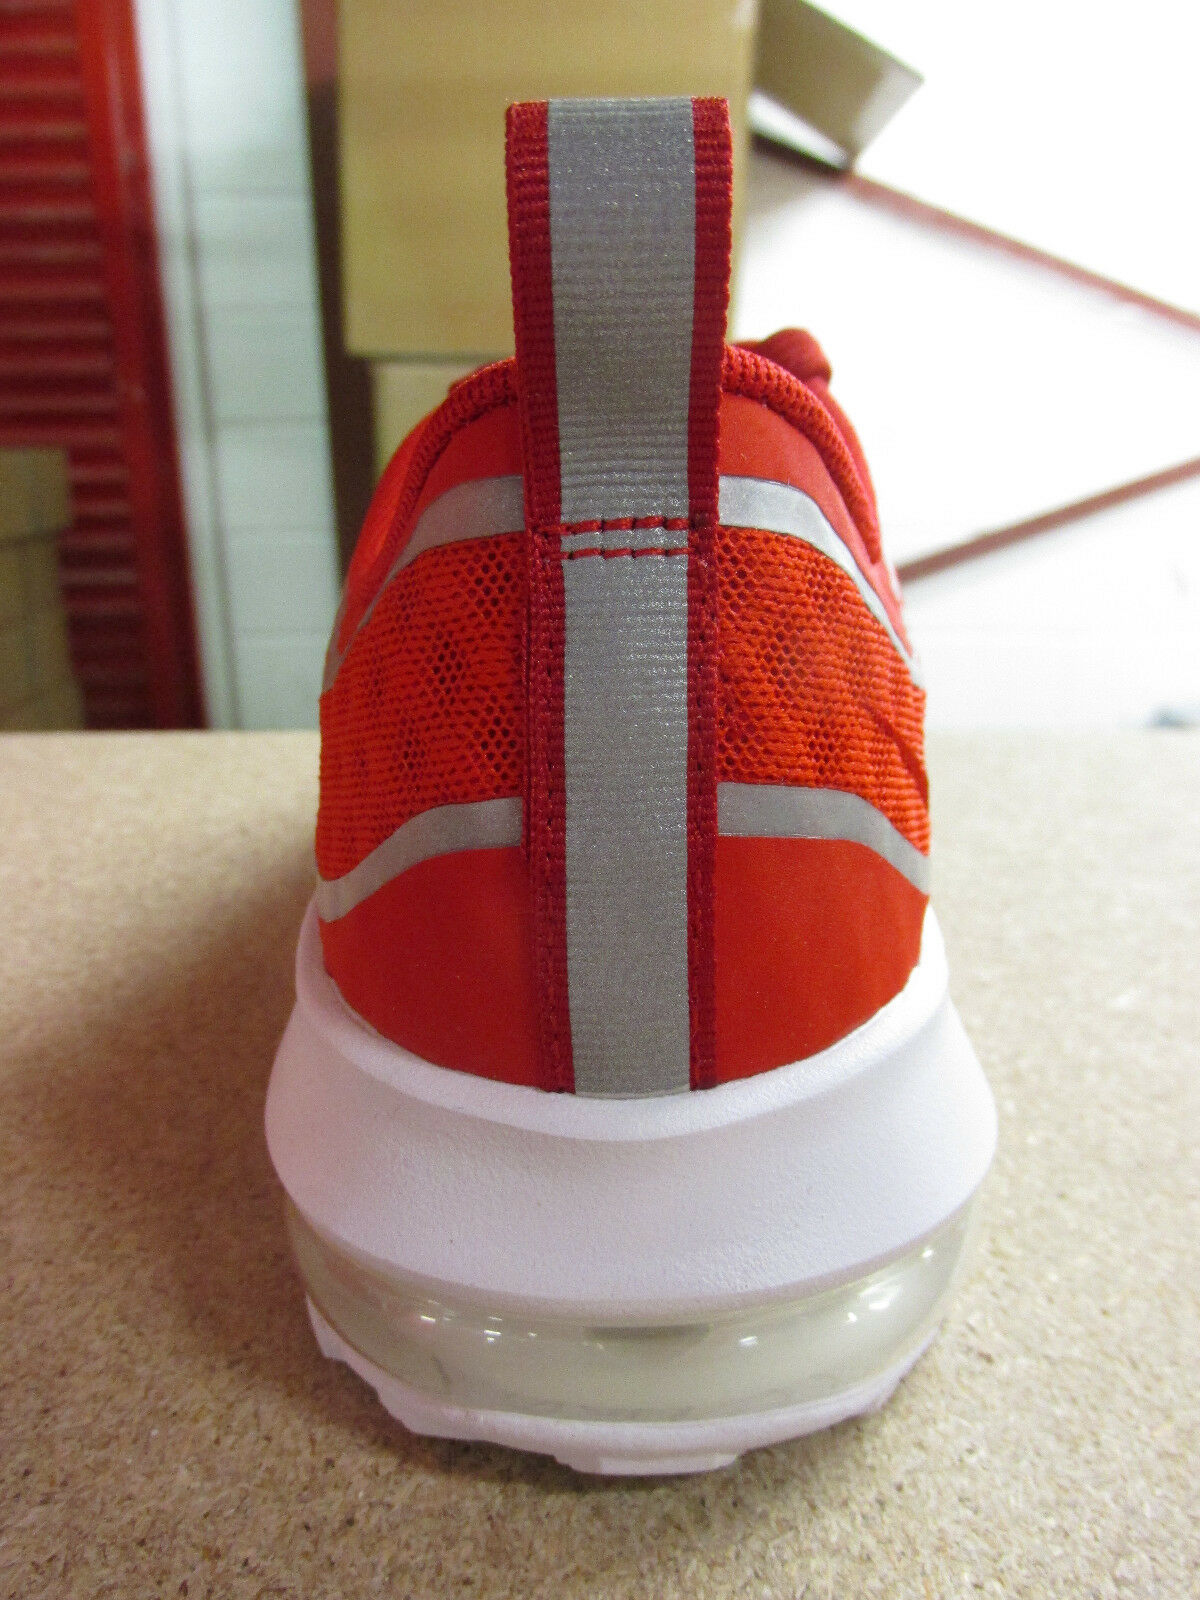 Nike Air Max Max Max Mercurial 98 Mens Running Trainers 818675 600 Turnschuhe schuhe 629b95